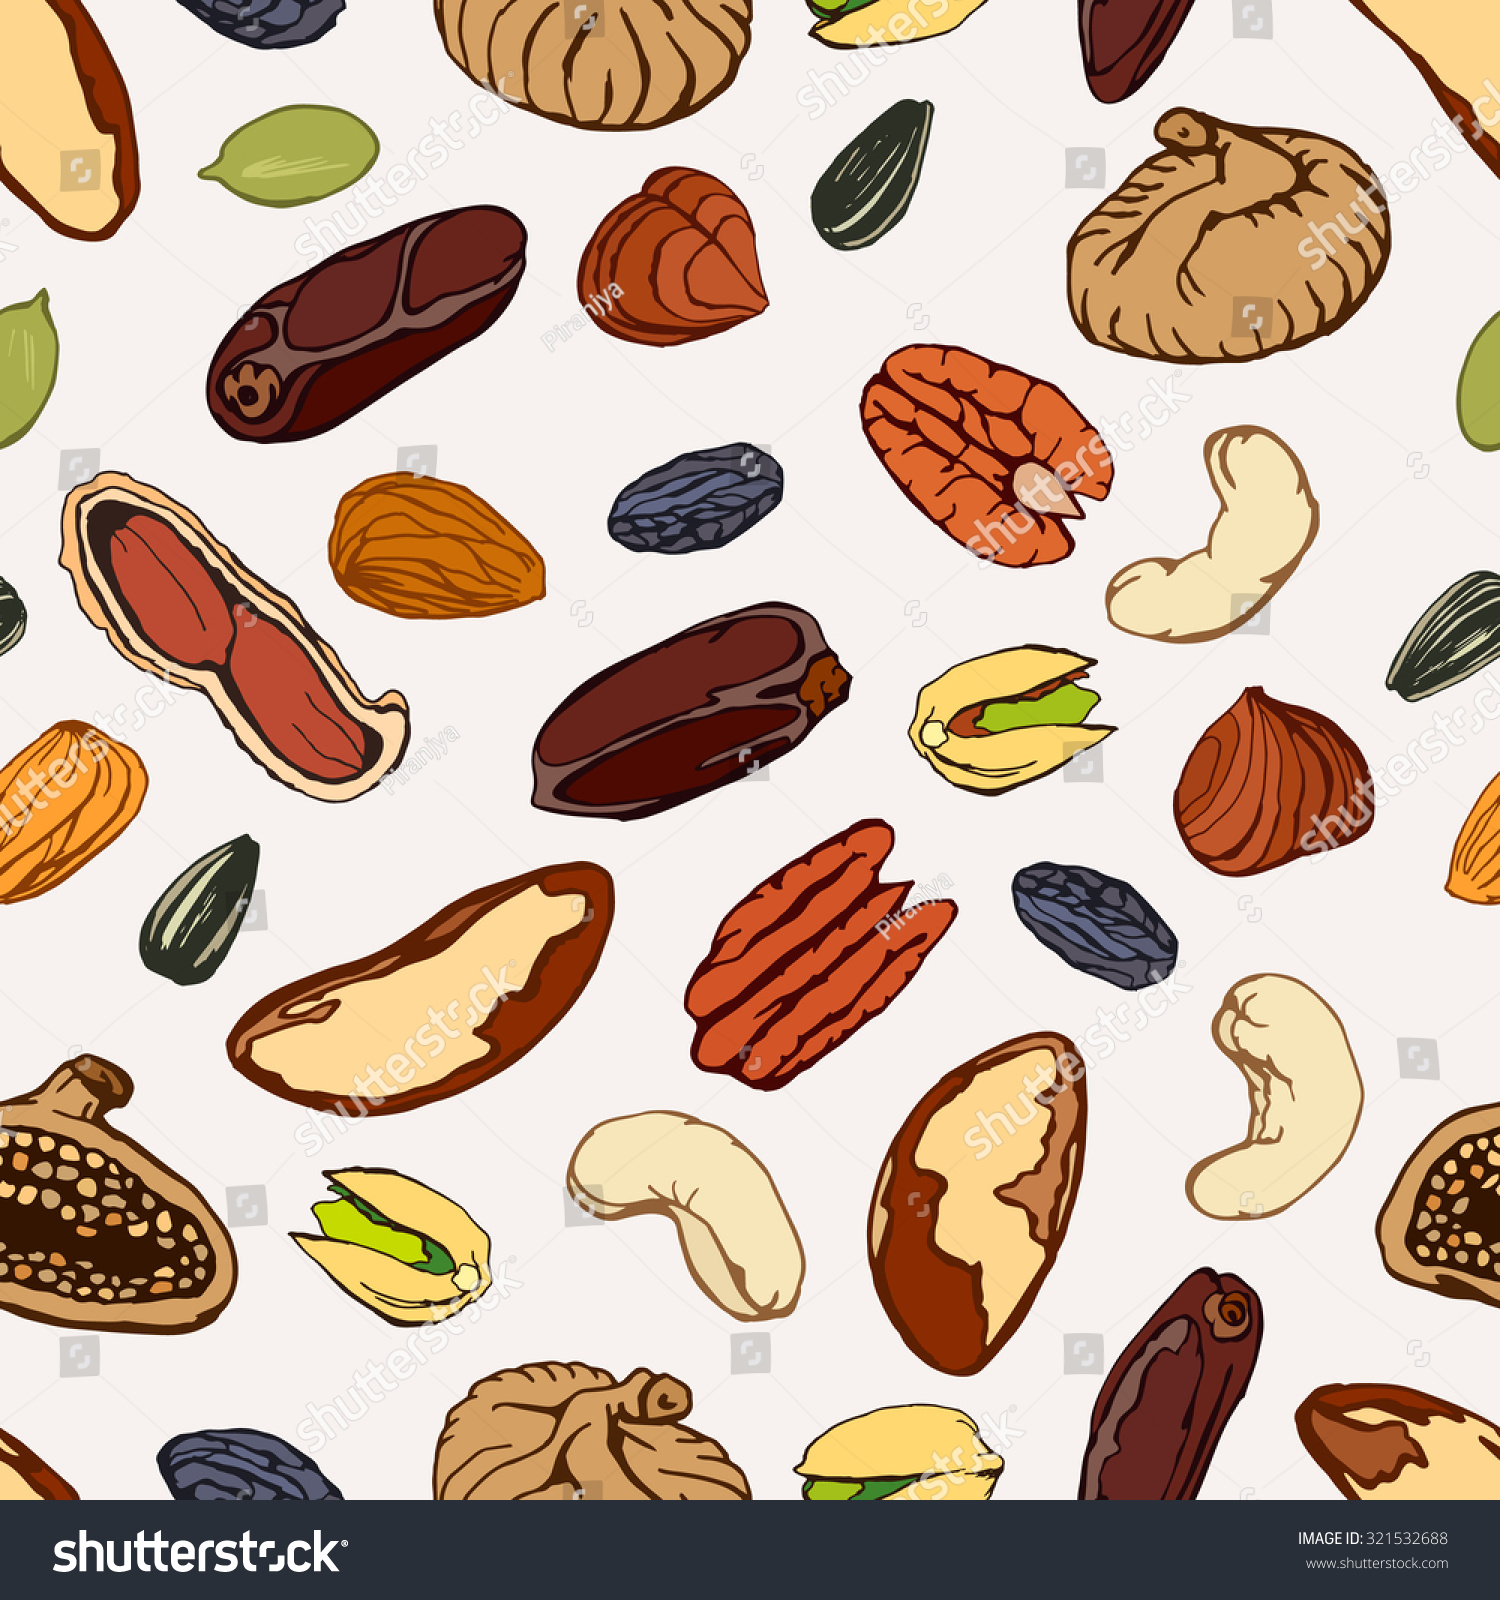 david sunflower seeds clipart - photo #13